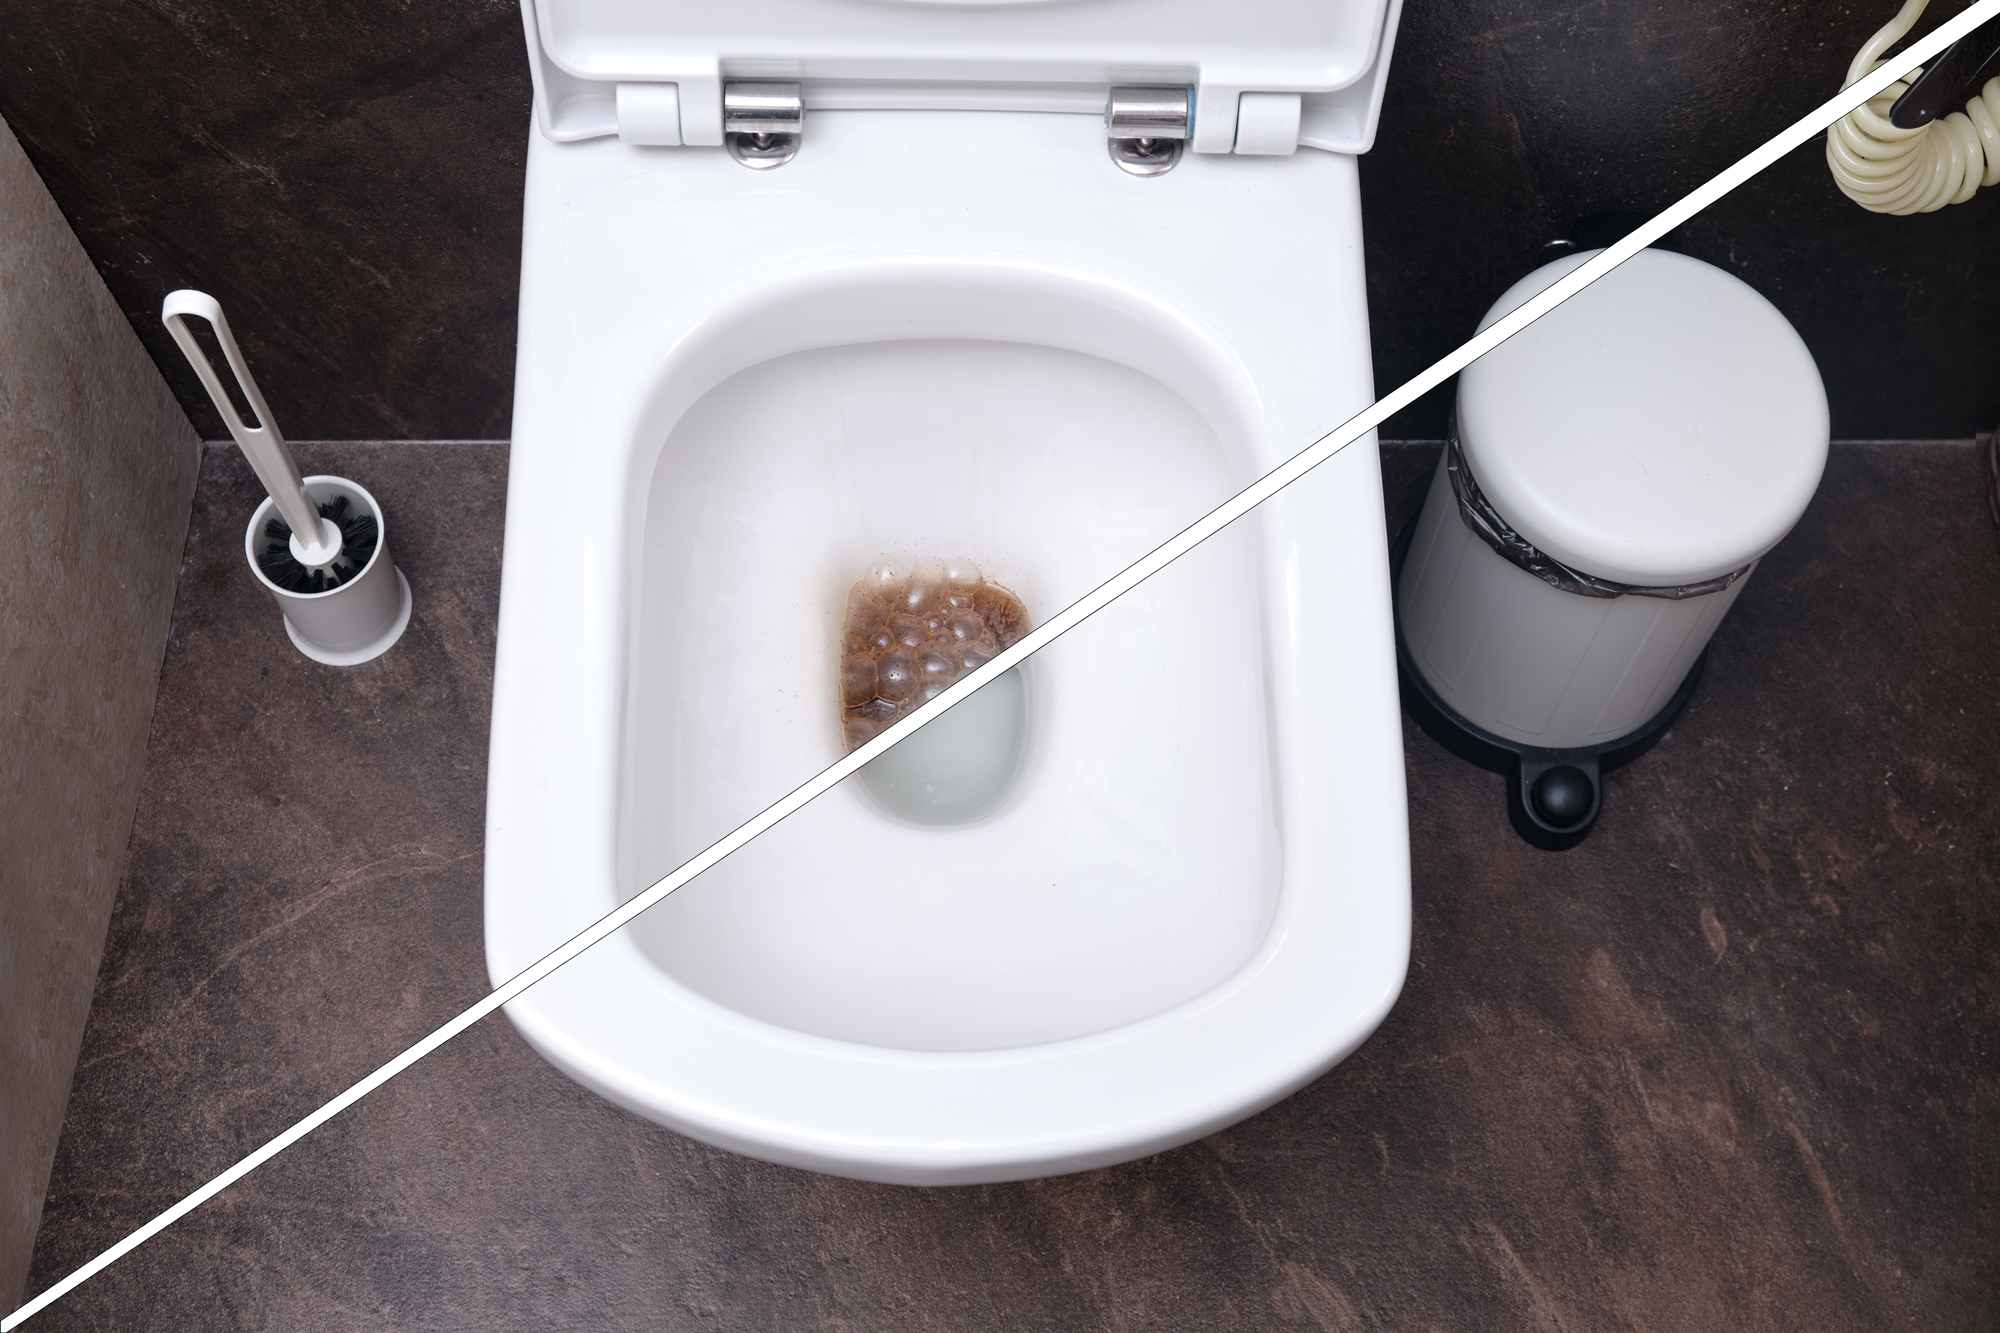 Unclog toilet near me